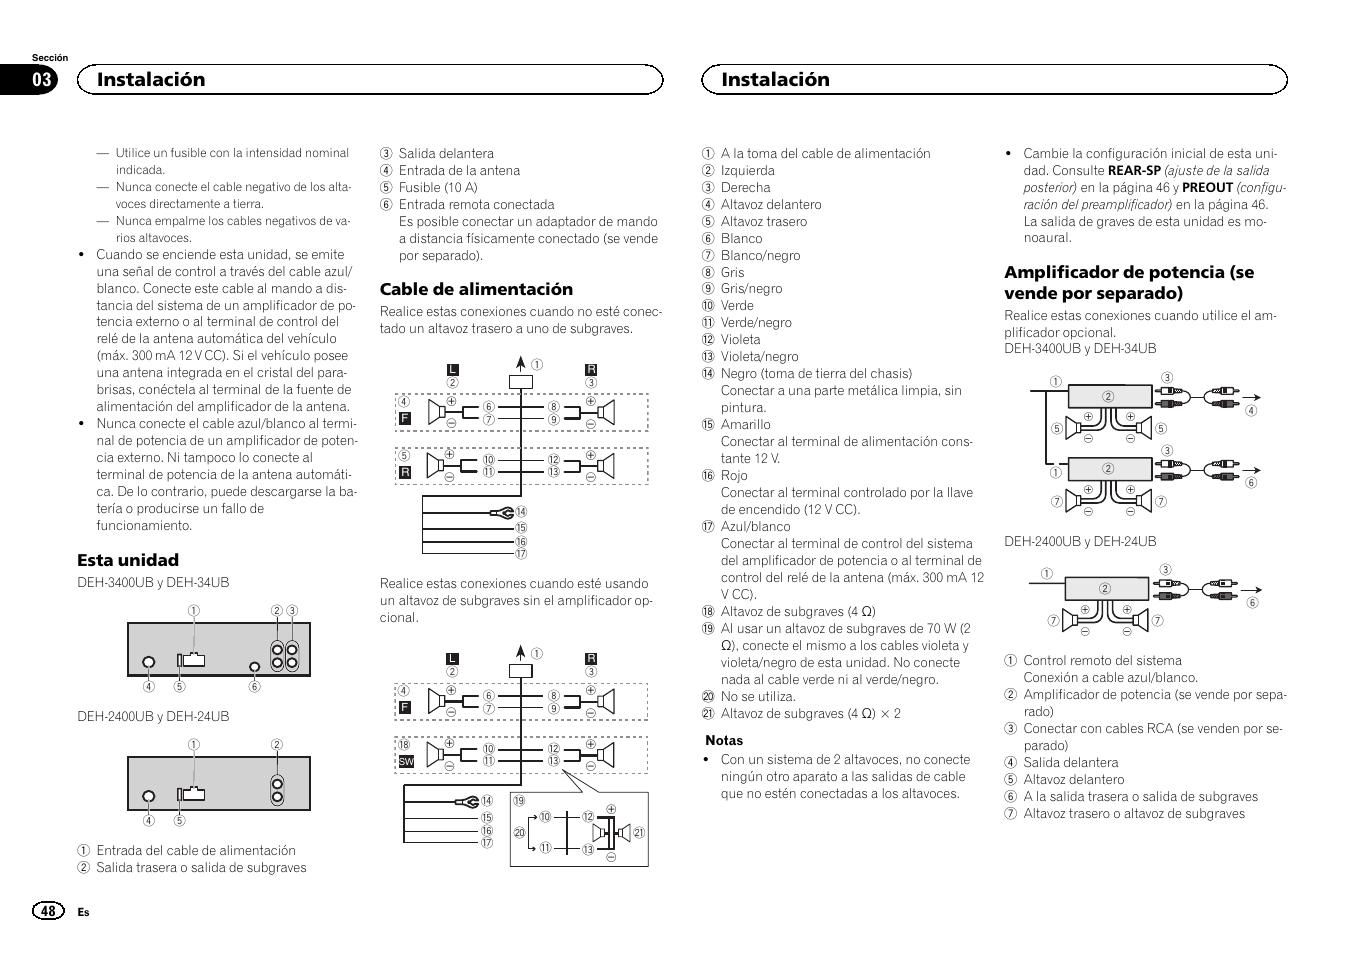 pioneer radio manual australian power plug wiring diagram instalacion deh 2400ub user page 48 56